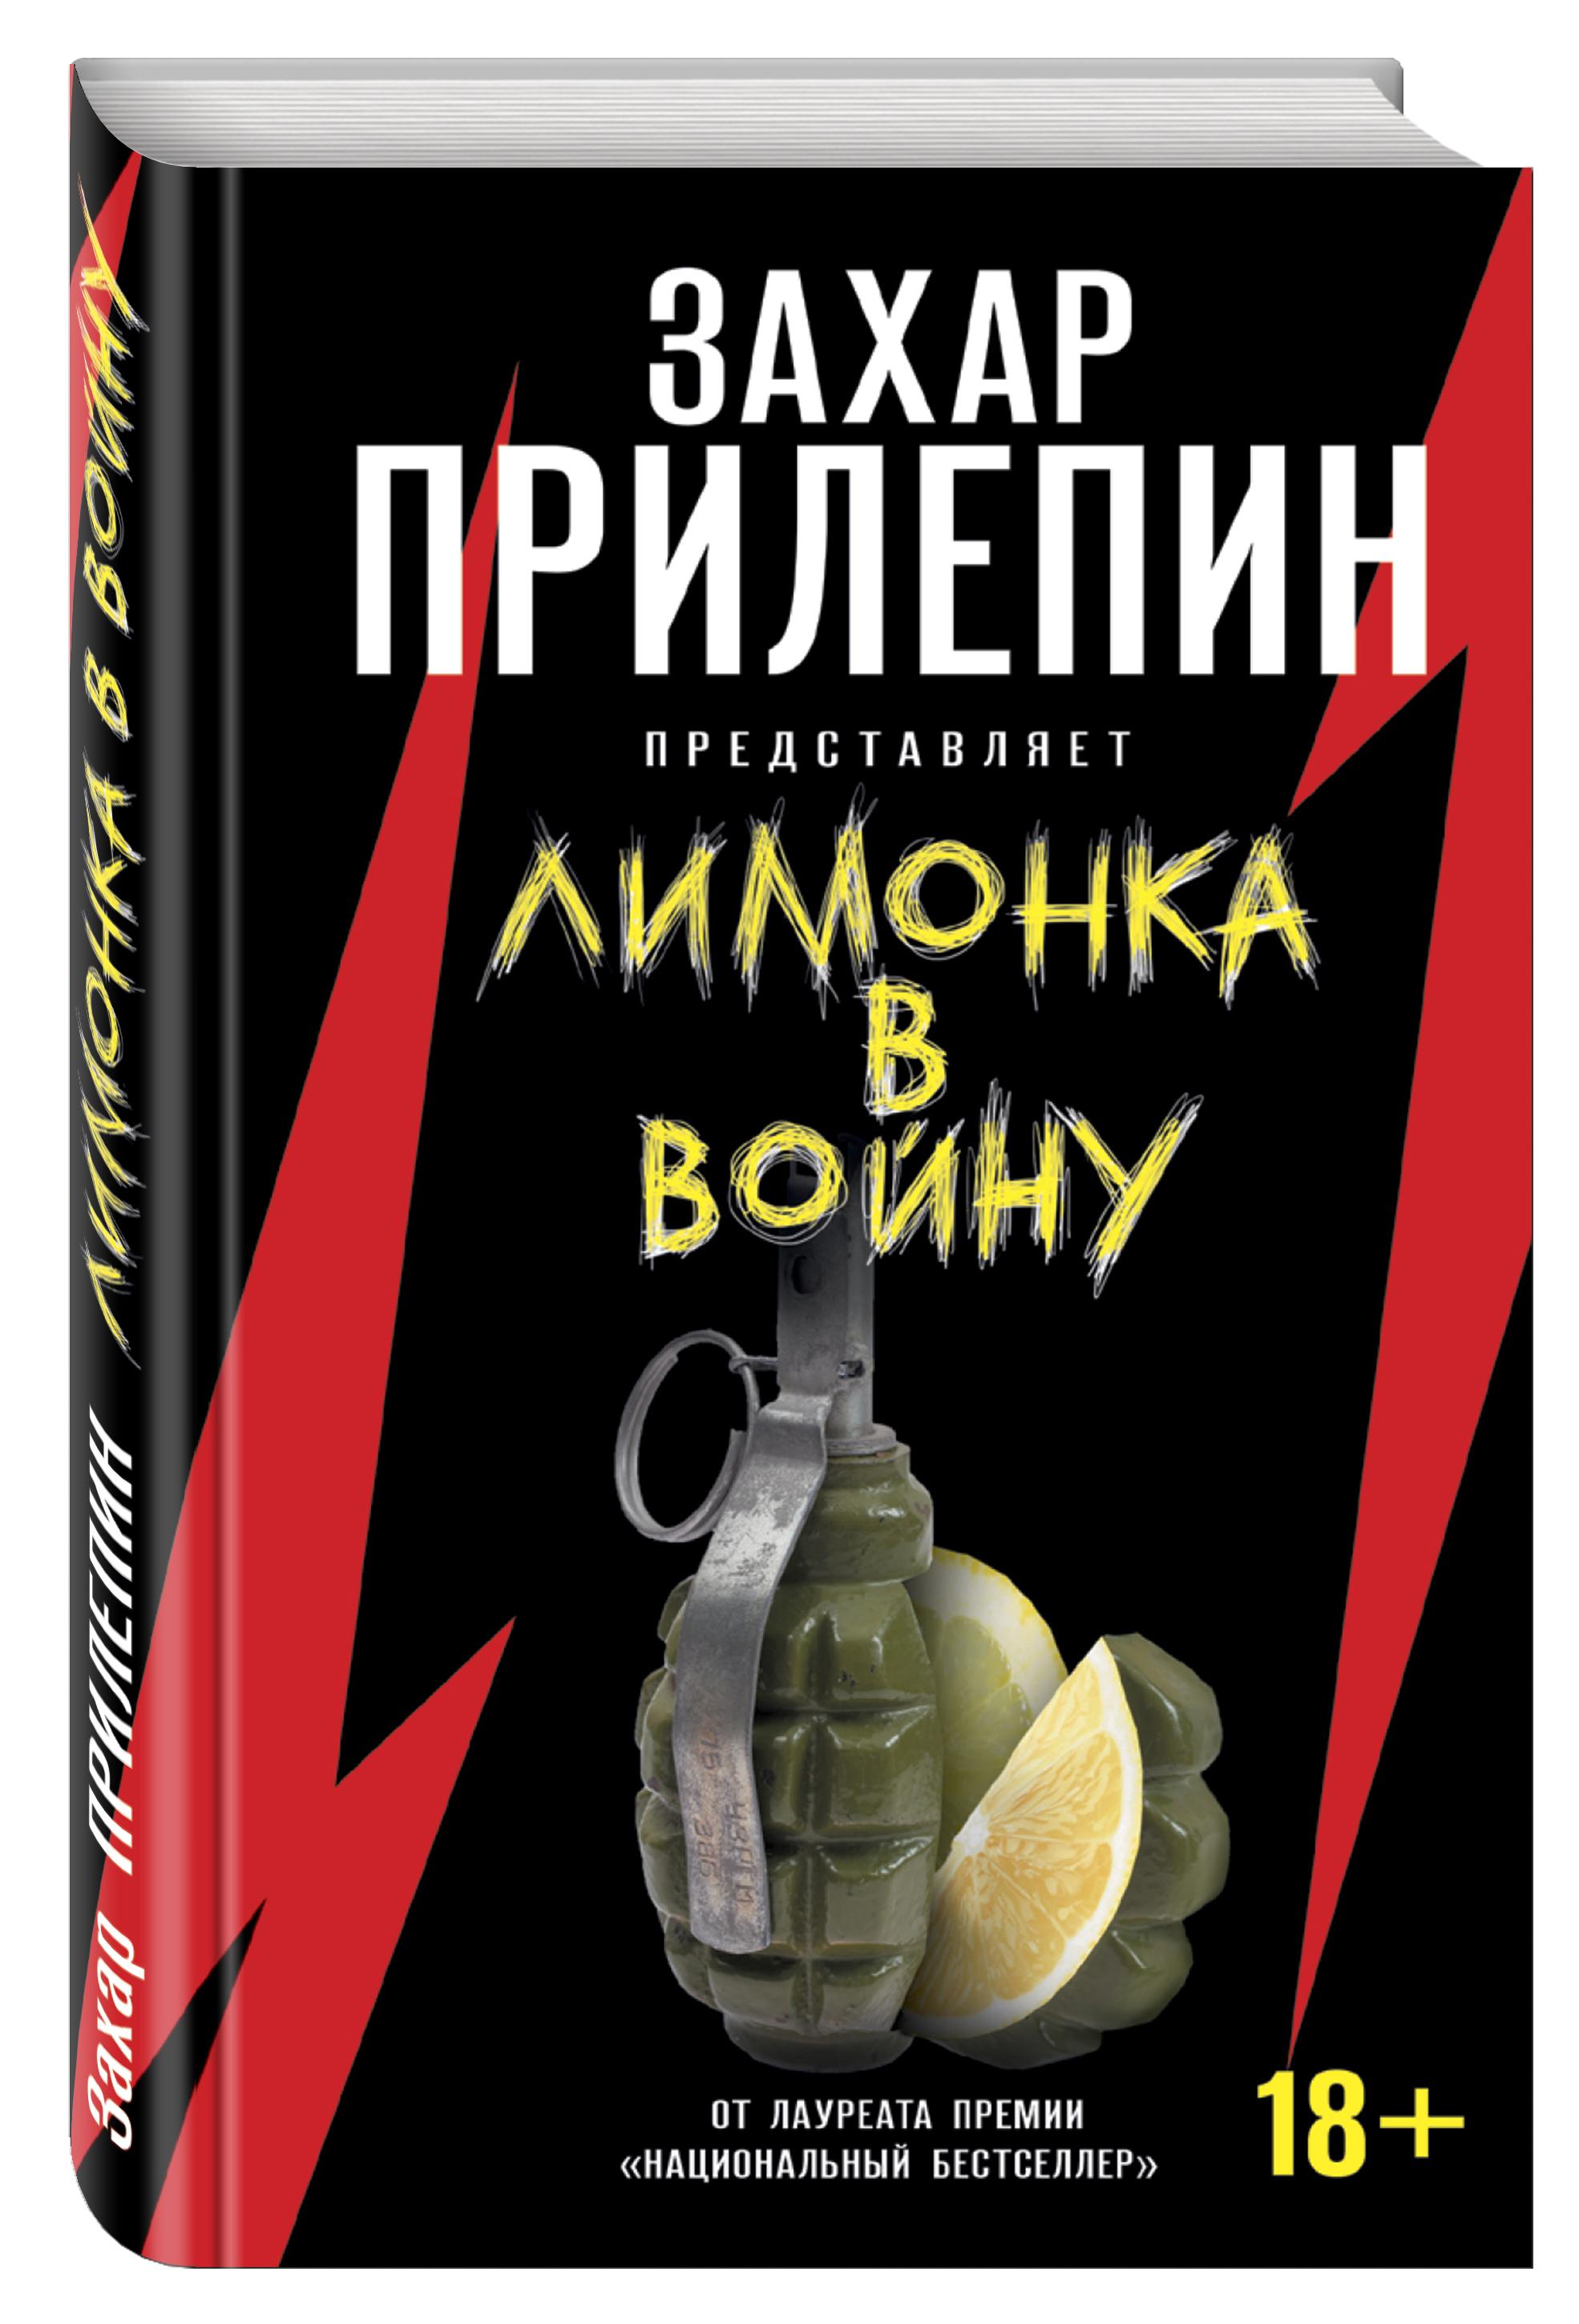 Захар Прилепин «Лимонка» в войну zamzam zamzam чечня